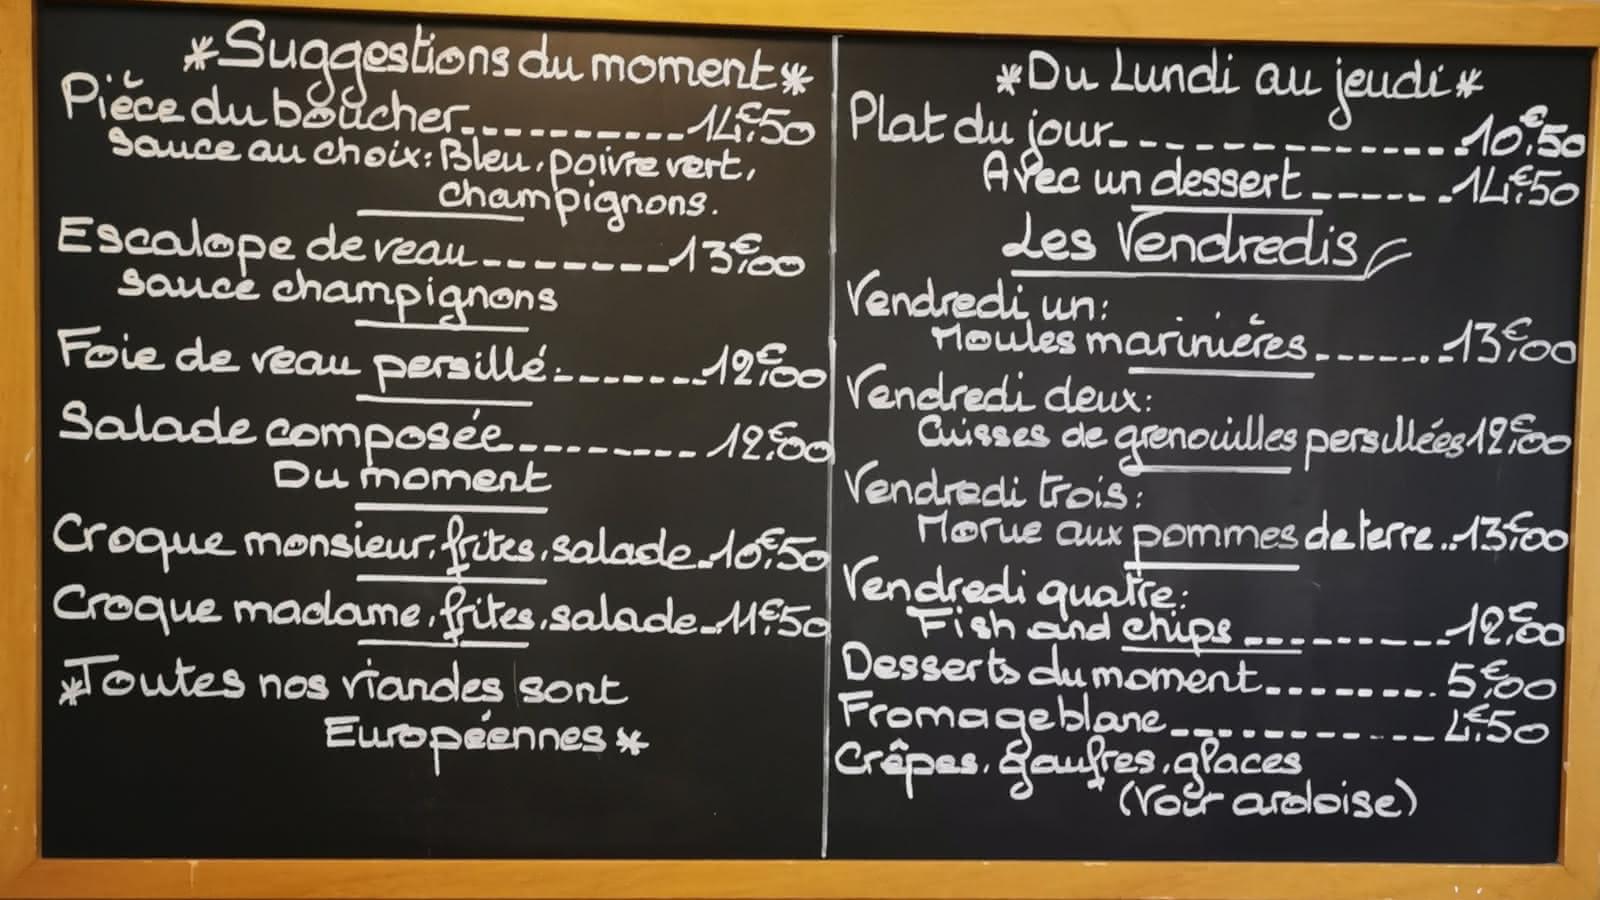 © Bar Brasserie La Lune